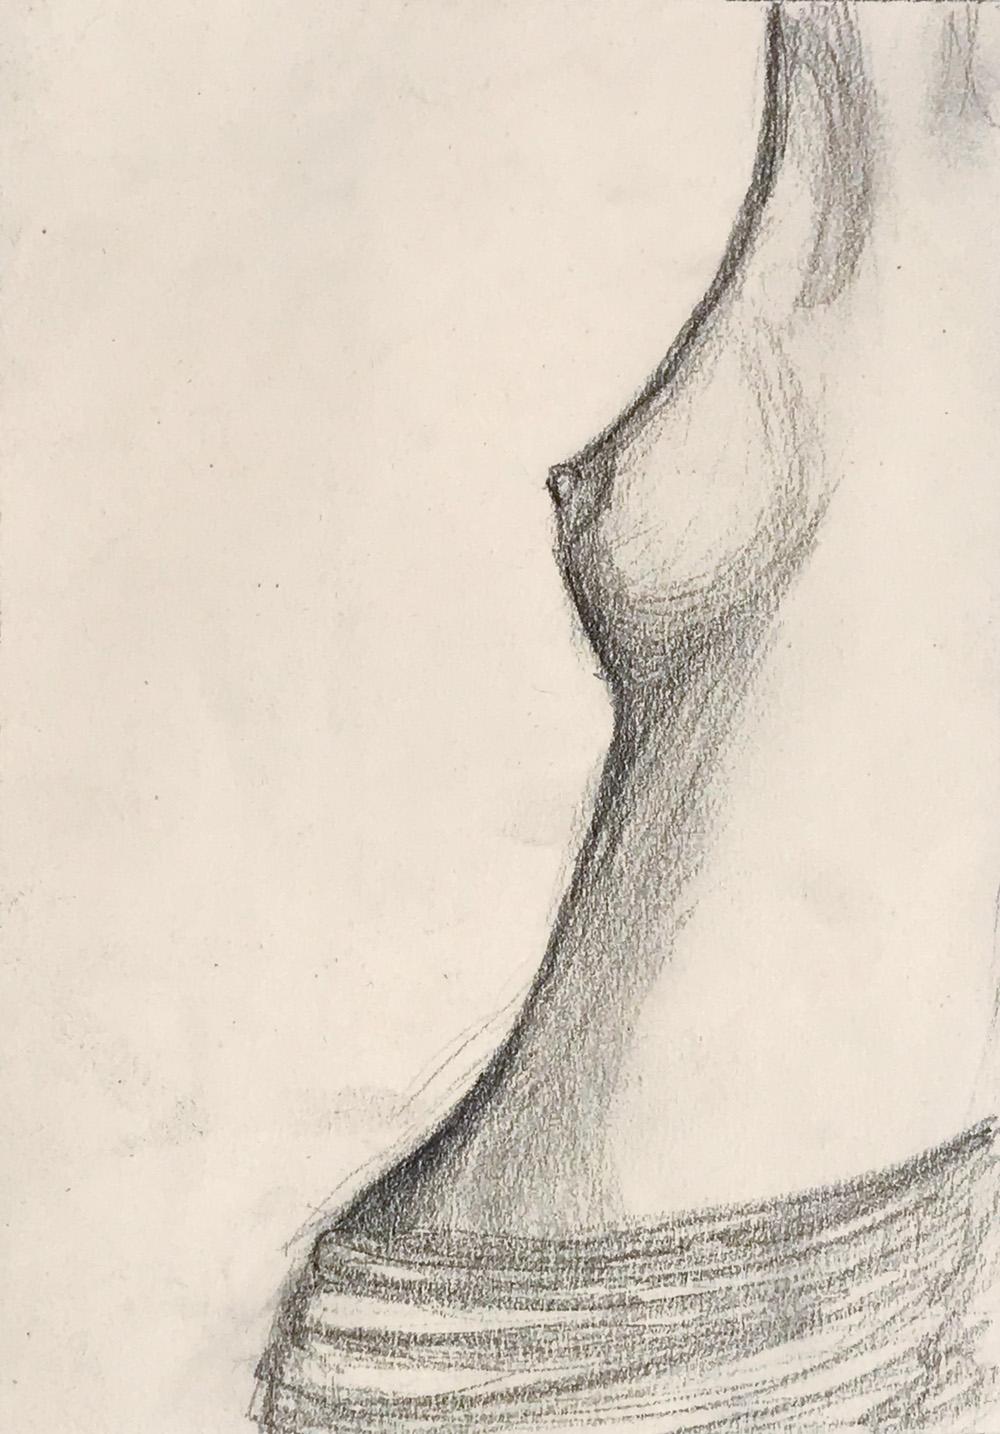 Indira-Cesarine-Silhouette-Graphite-on-paper-1987.jpg